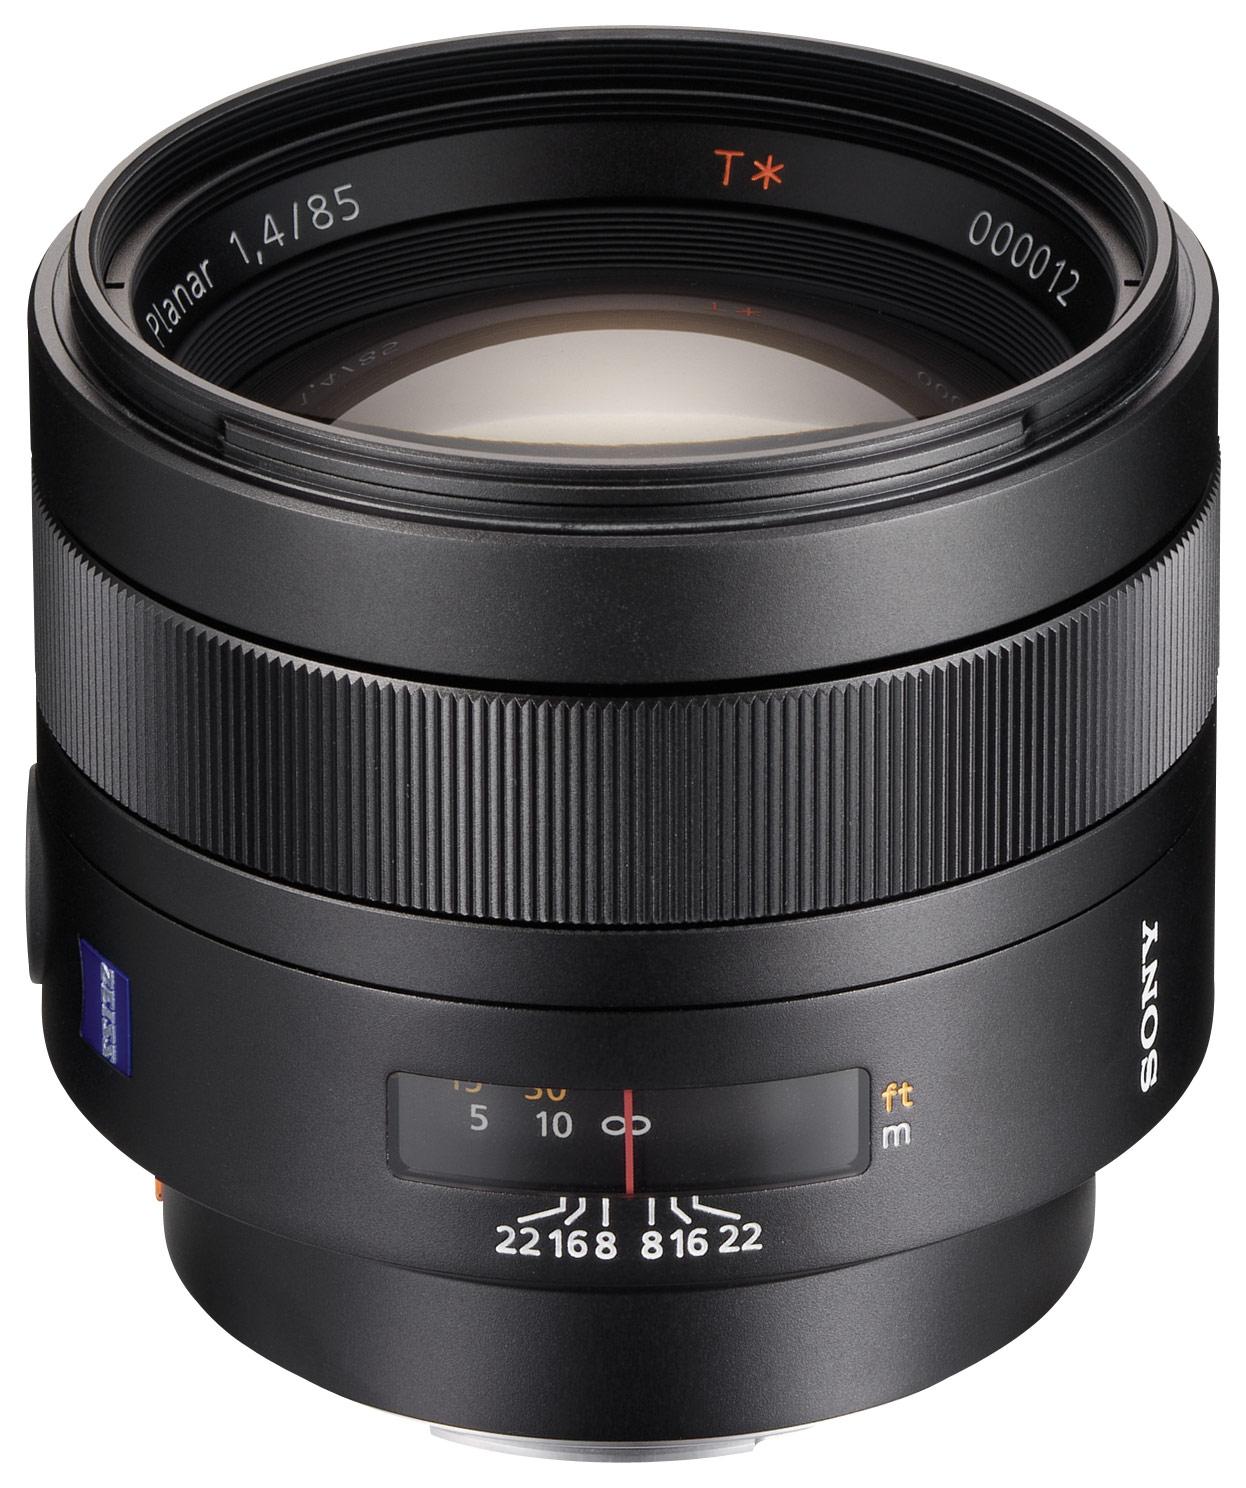 Sony - Carl Zeiss 85mm f/1.4 A-Mount Medium Telephoto Lens - Black